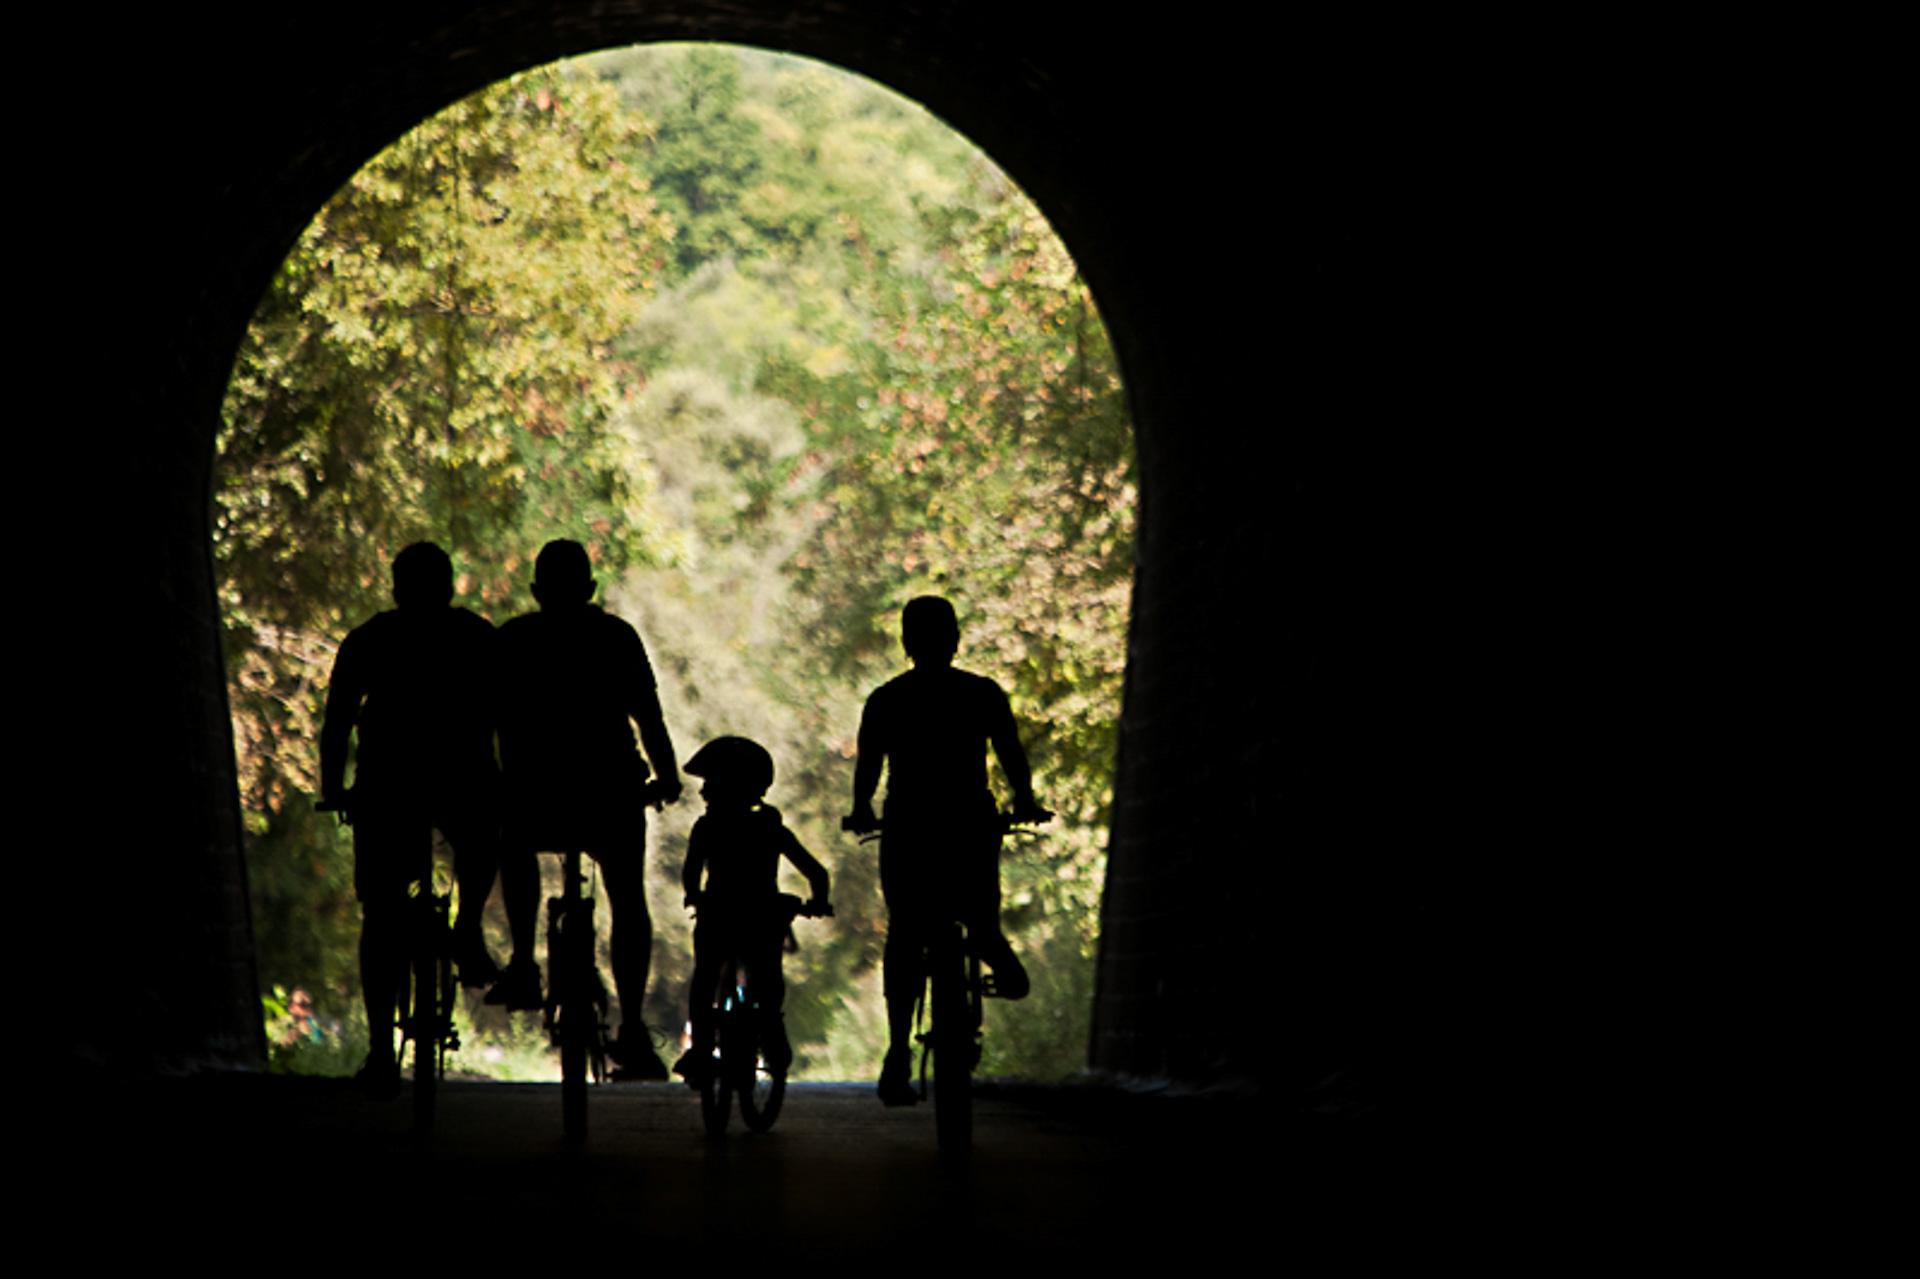 herault tourisme sports outdoor pleine nature photographe olivier octobre montpelier